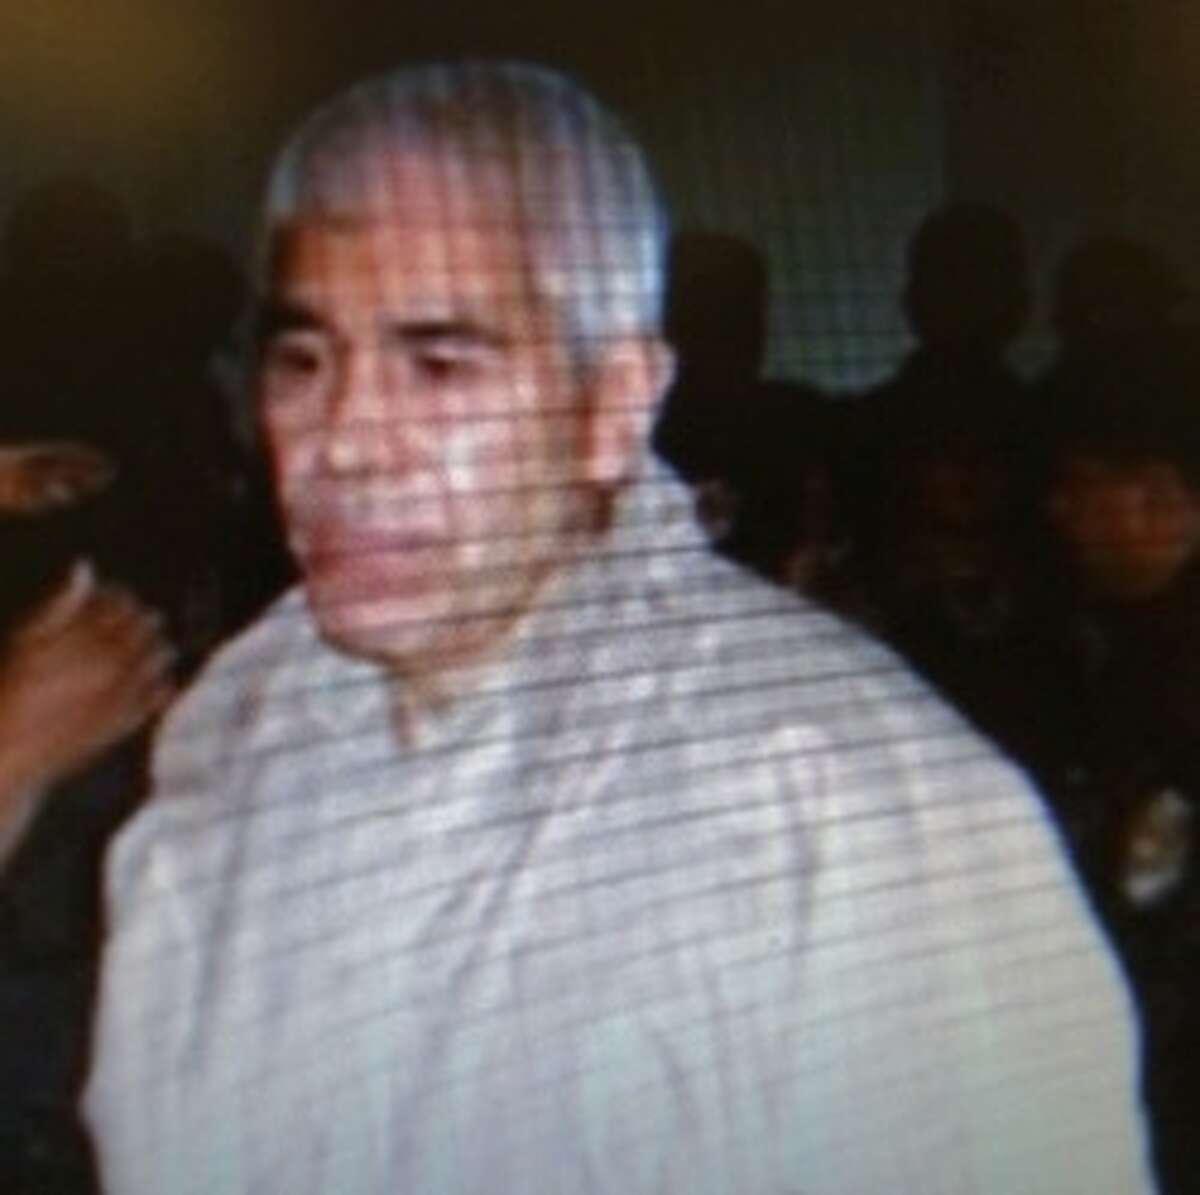 Rafael Caro-Quintero: From 1982 to 1984, U.S. Drug Enforcement Administration (DEA) special agent Enrique